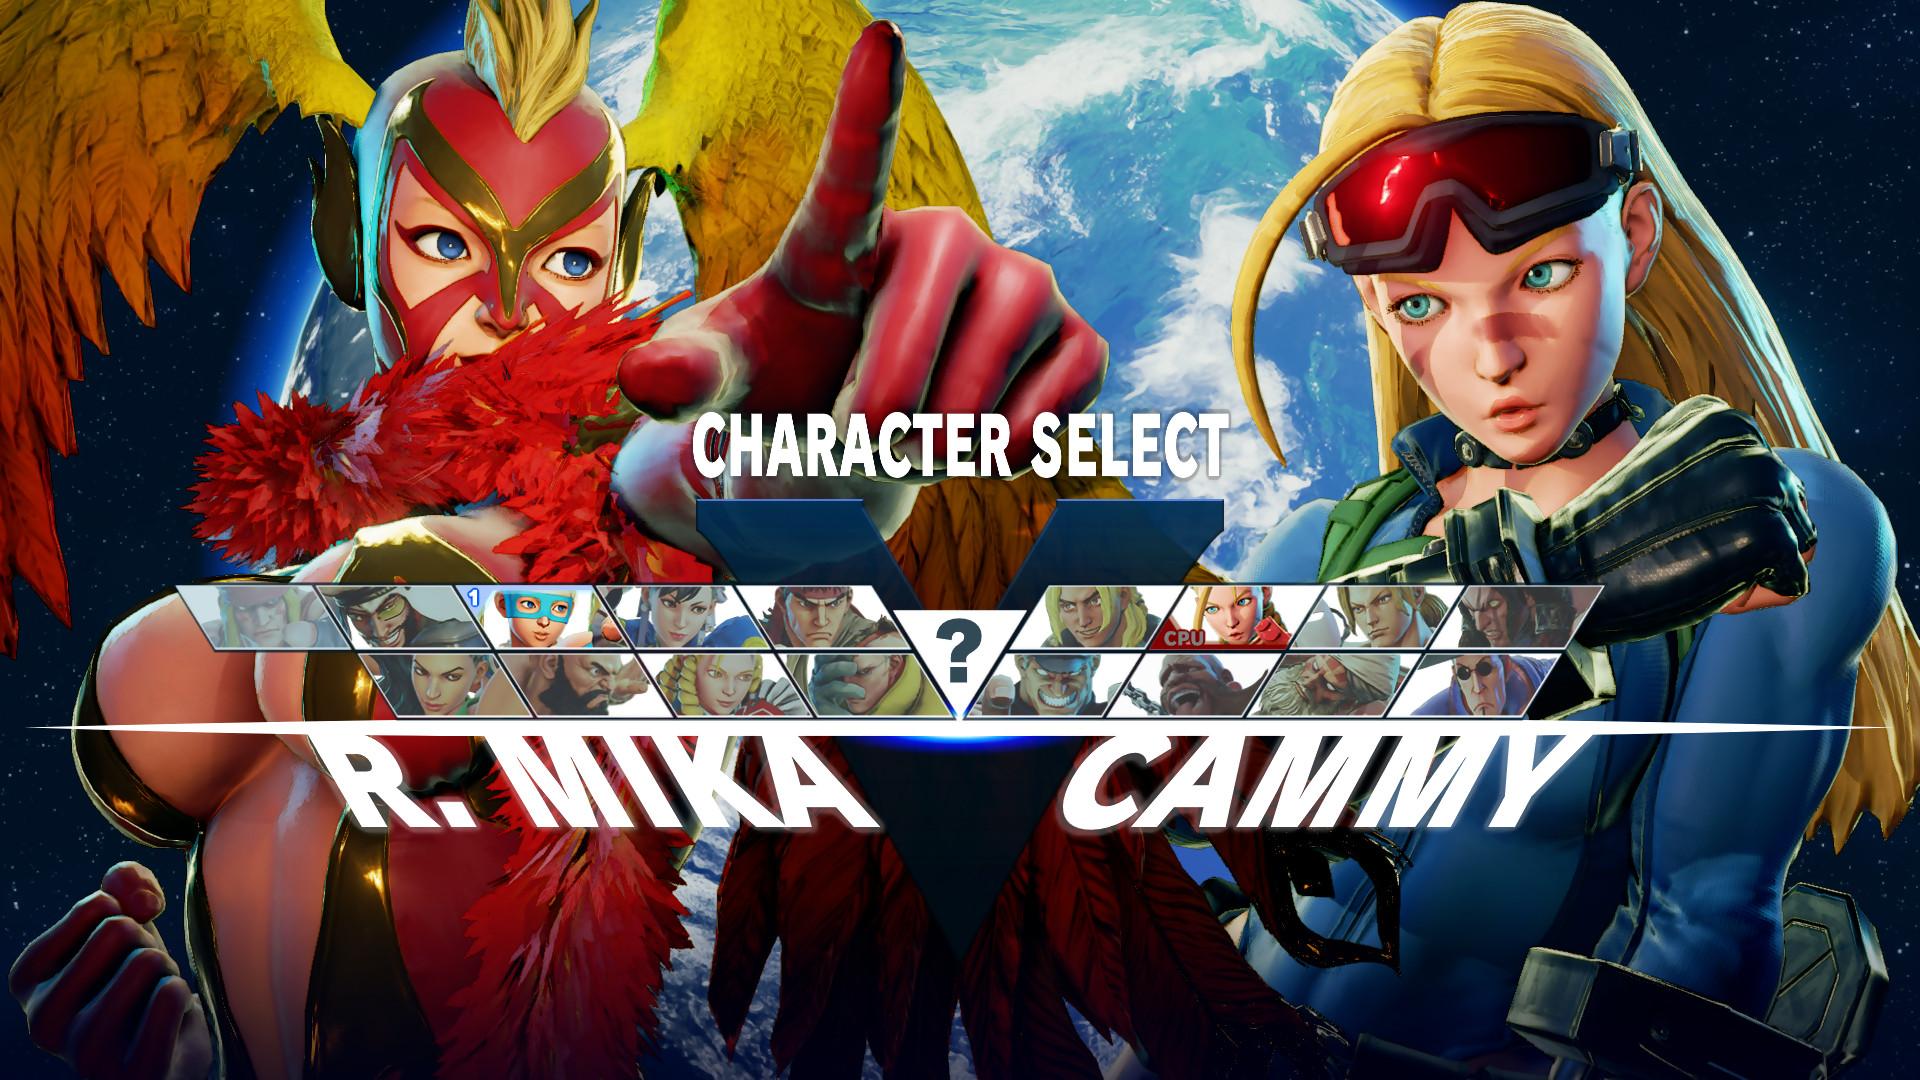 Le Messie revient ! Street Fighter V est annoncé  - Page 25 Street-fighter-5-56fae9688cf76